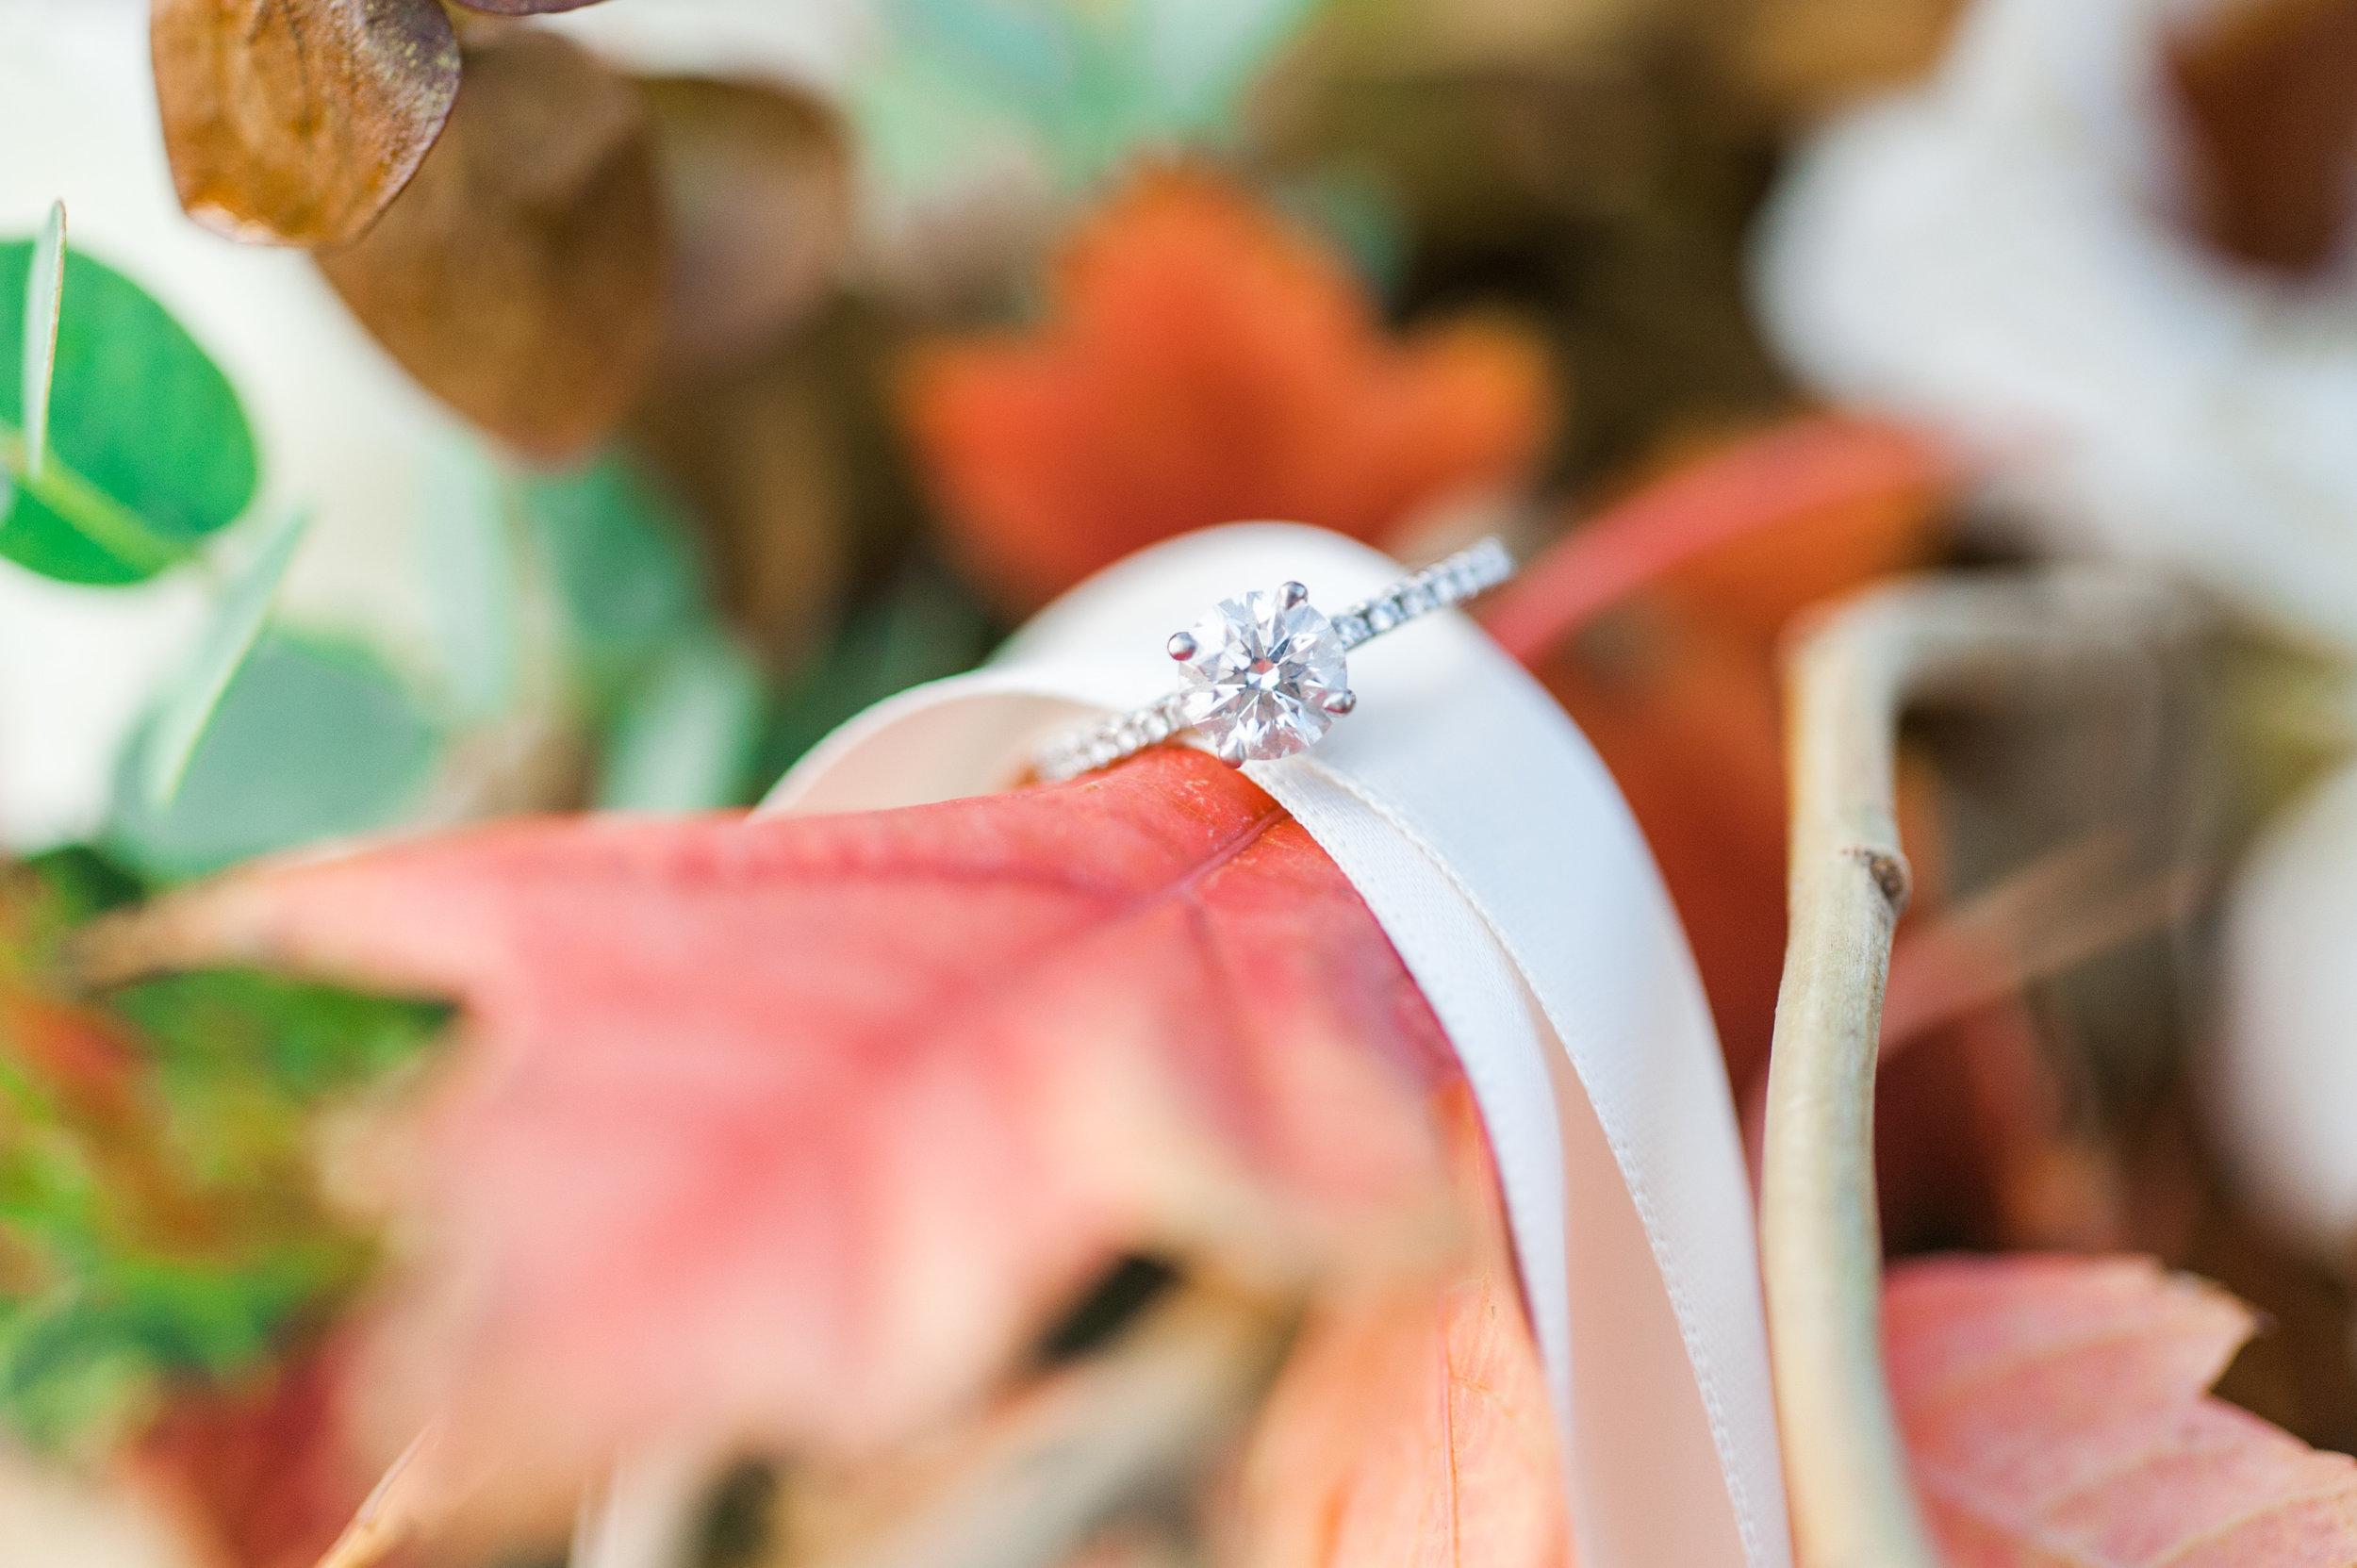 omaha-engagements-outdoor-fall-florists-16.jpg